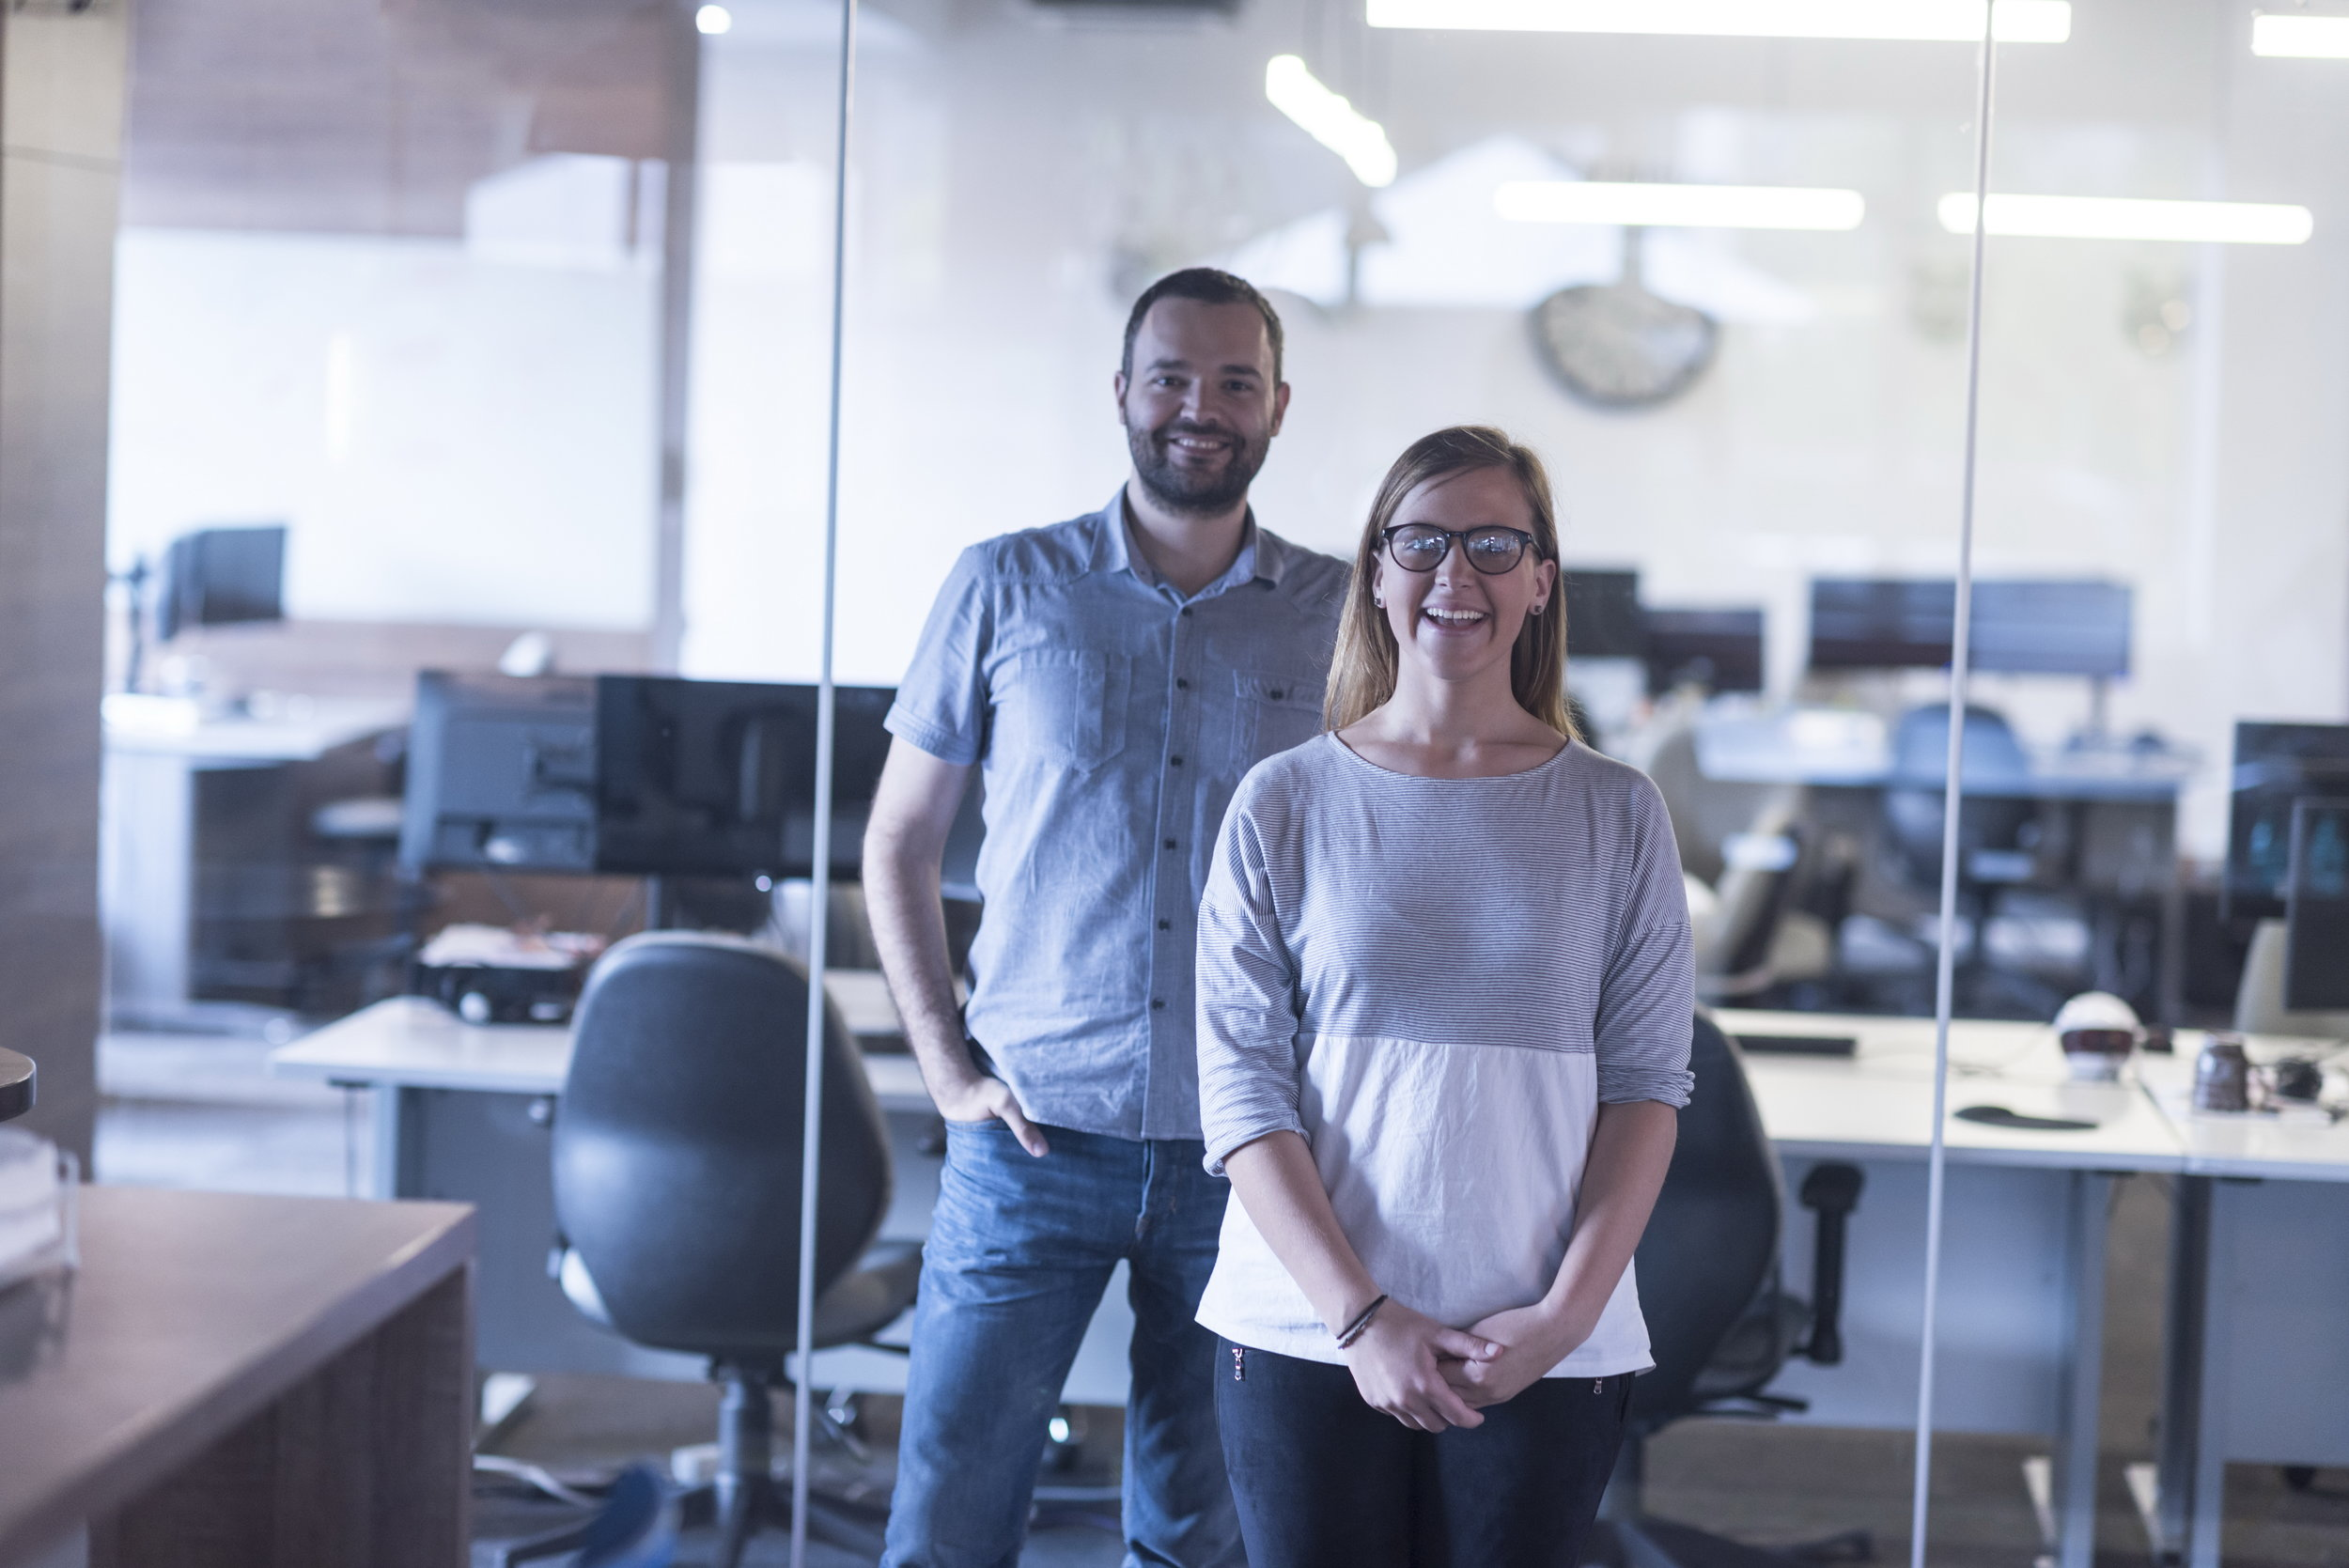 business-couple-at-office-P7BX5KU.jpg